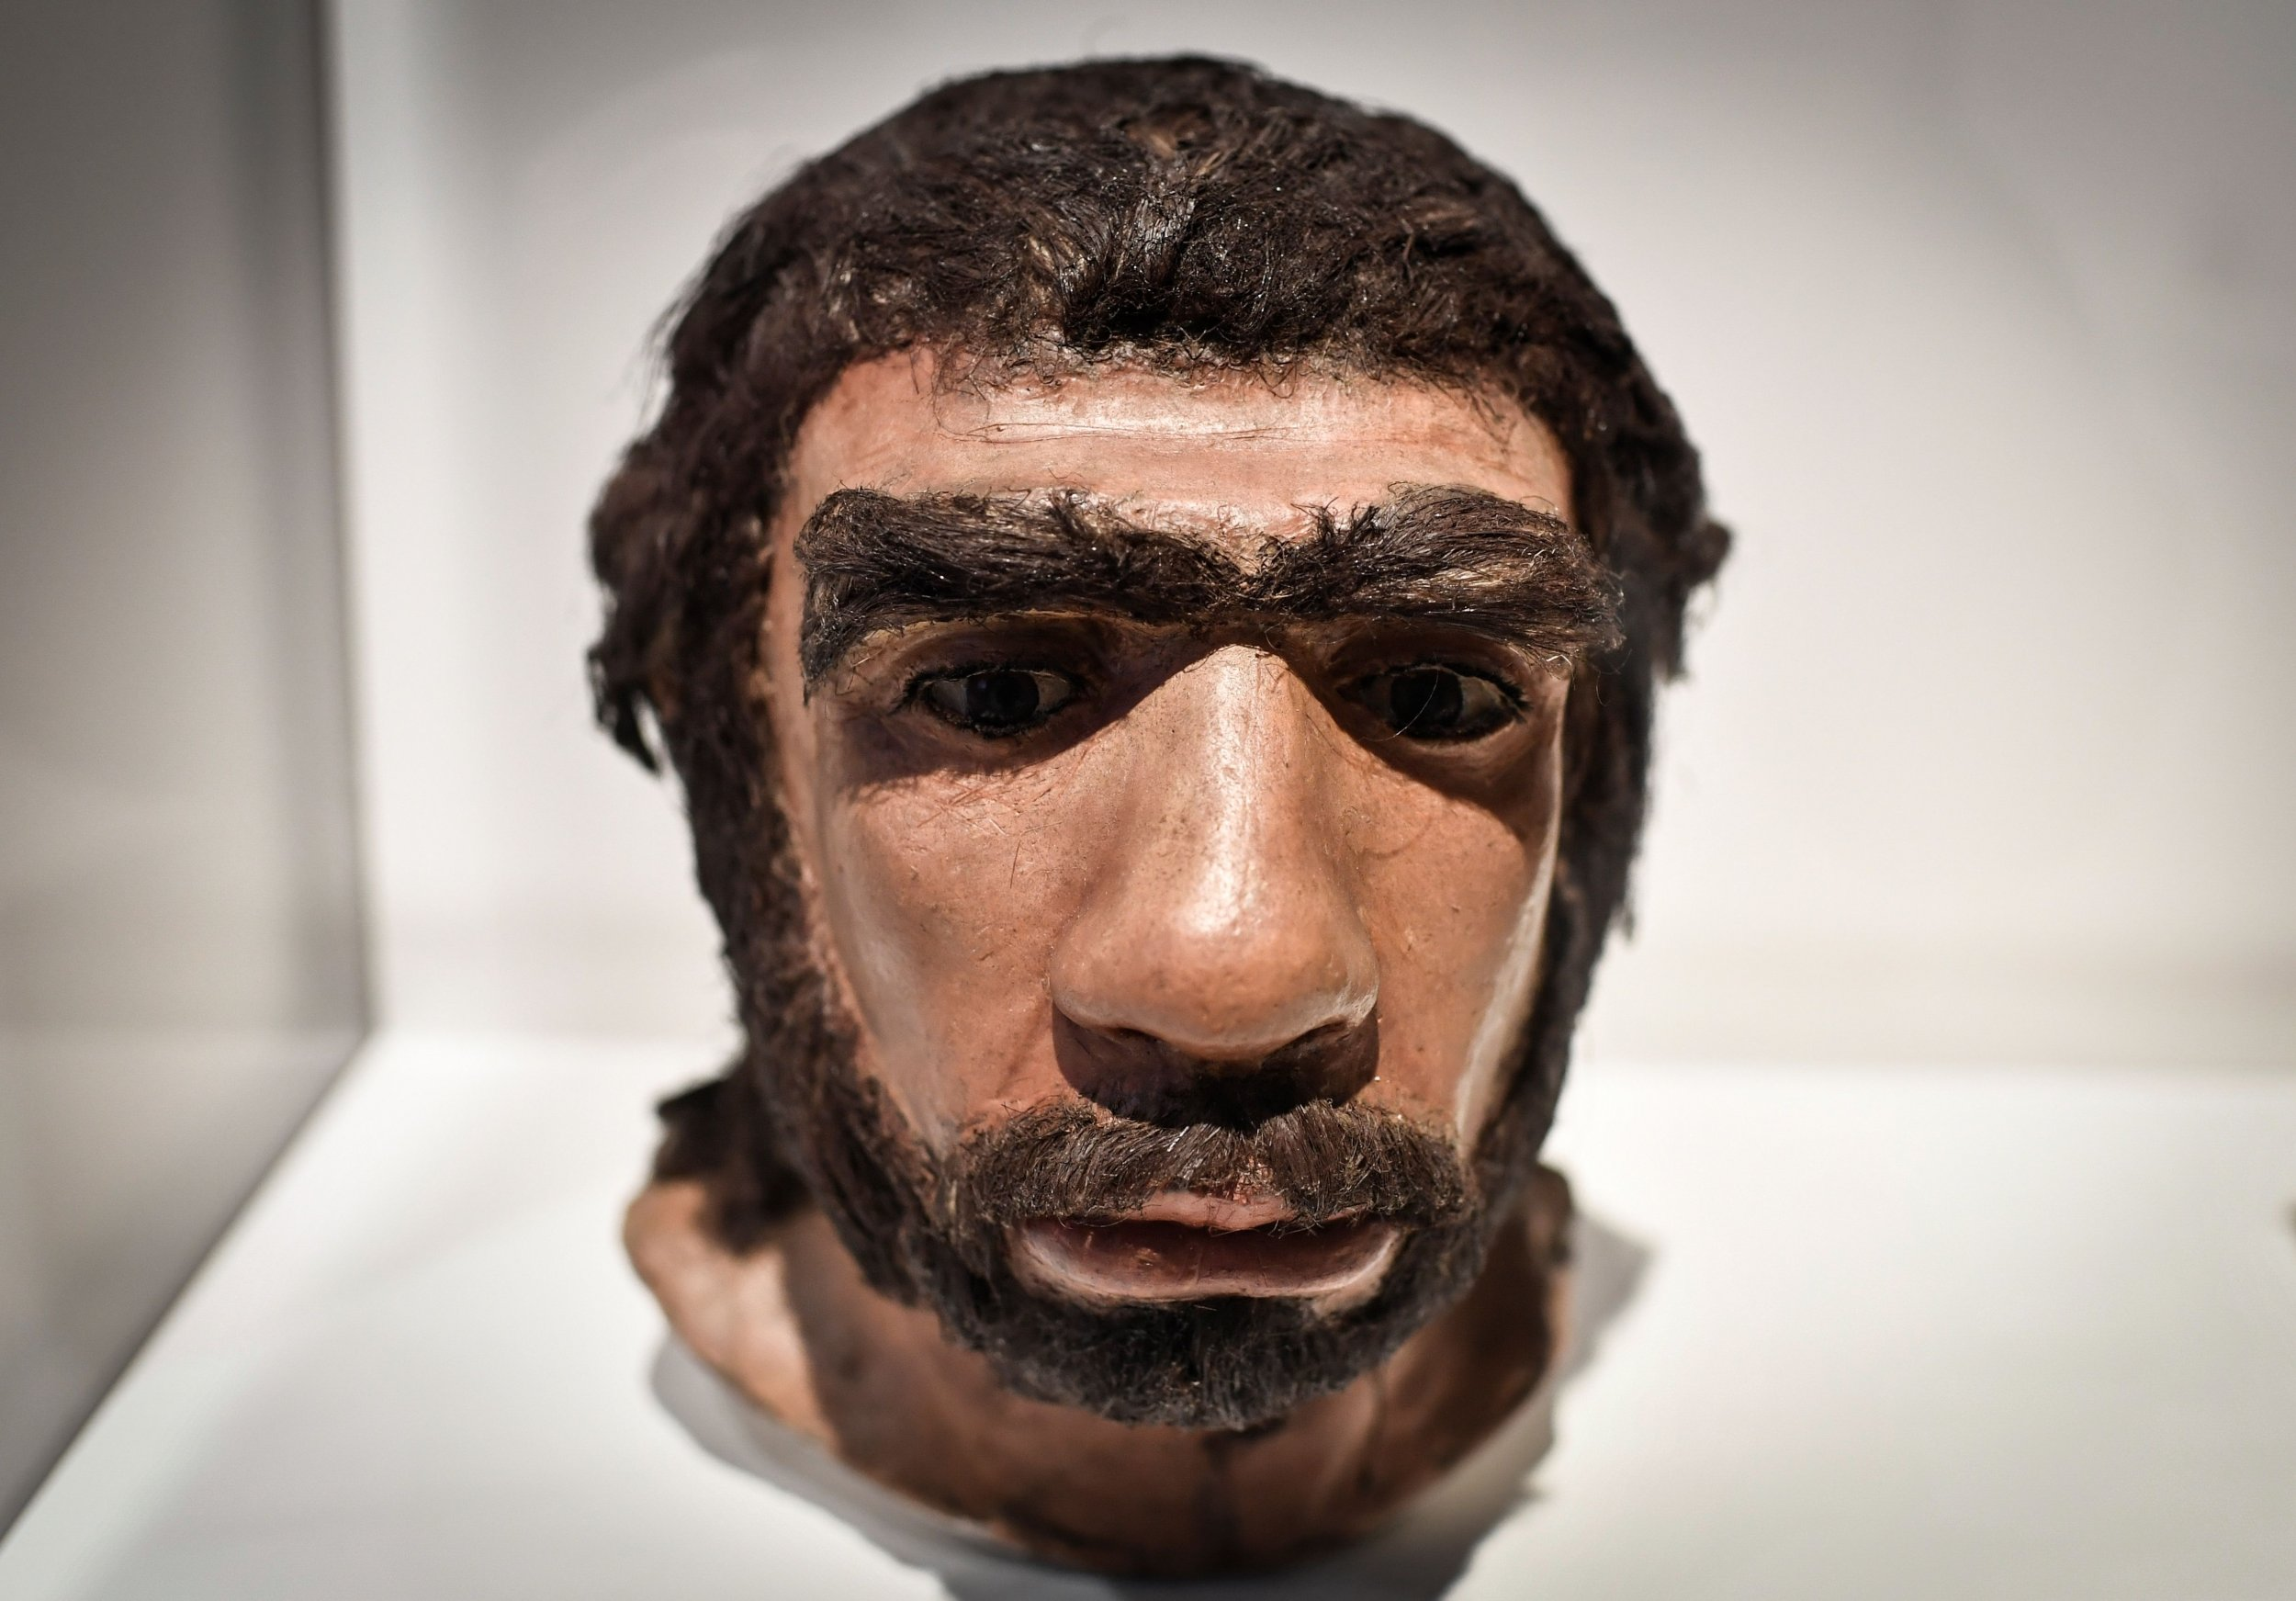 04_04_neanderthal_nose_breathing